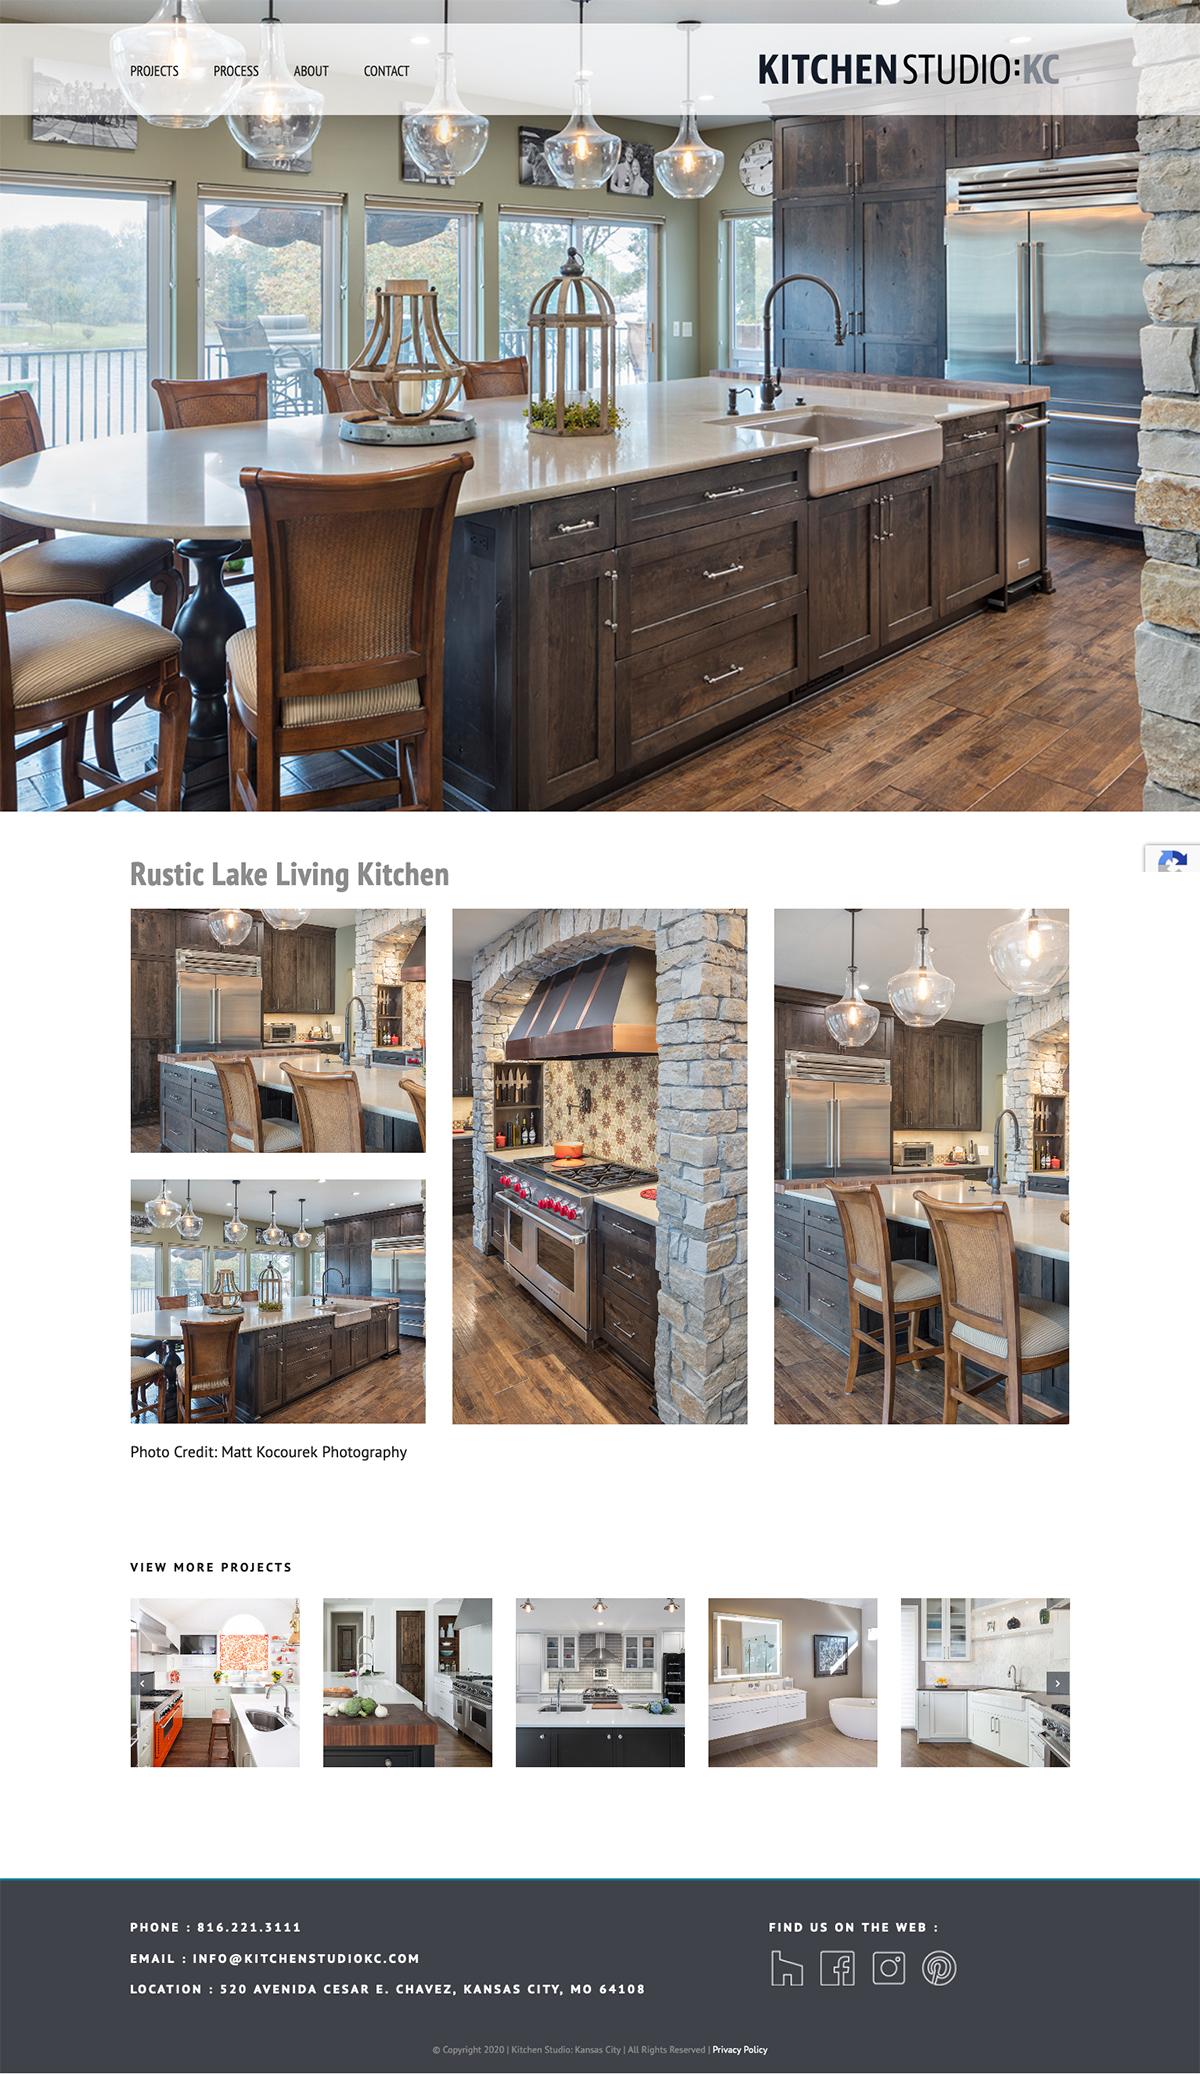 Kitchen Studio:KC business portfolio website